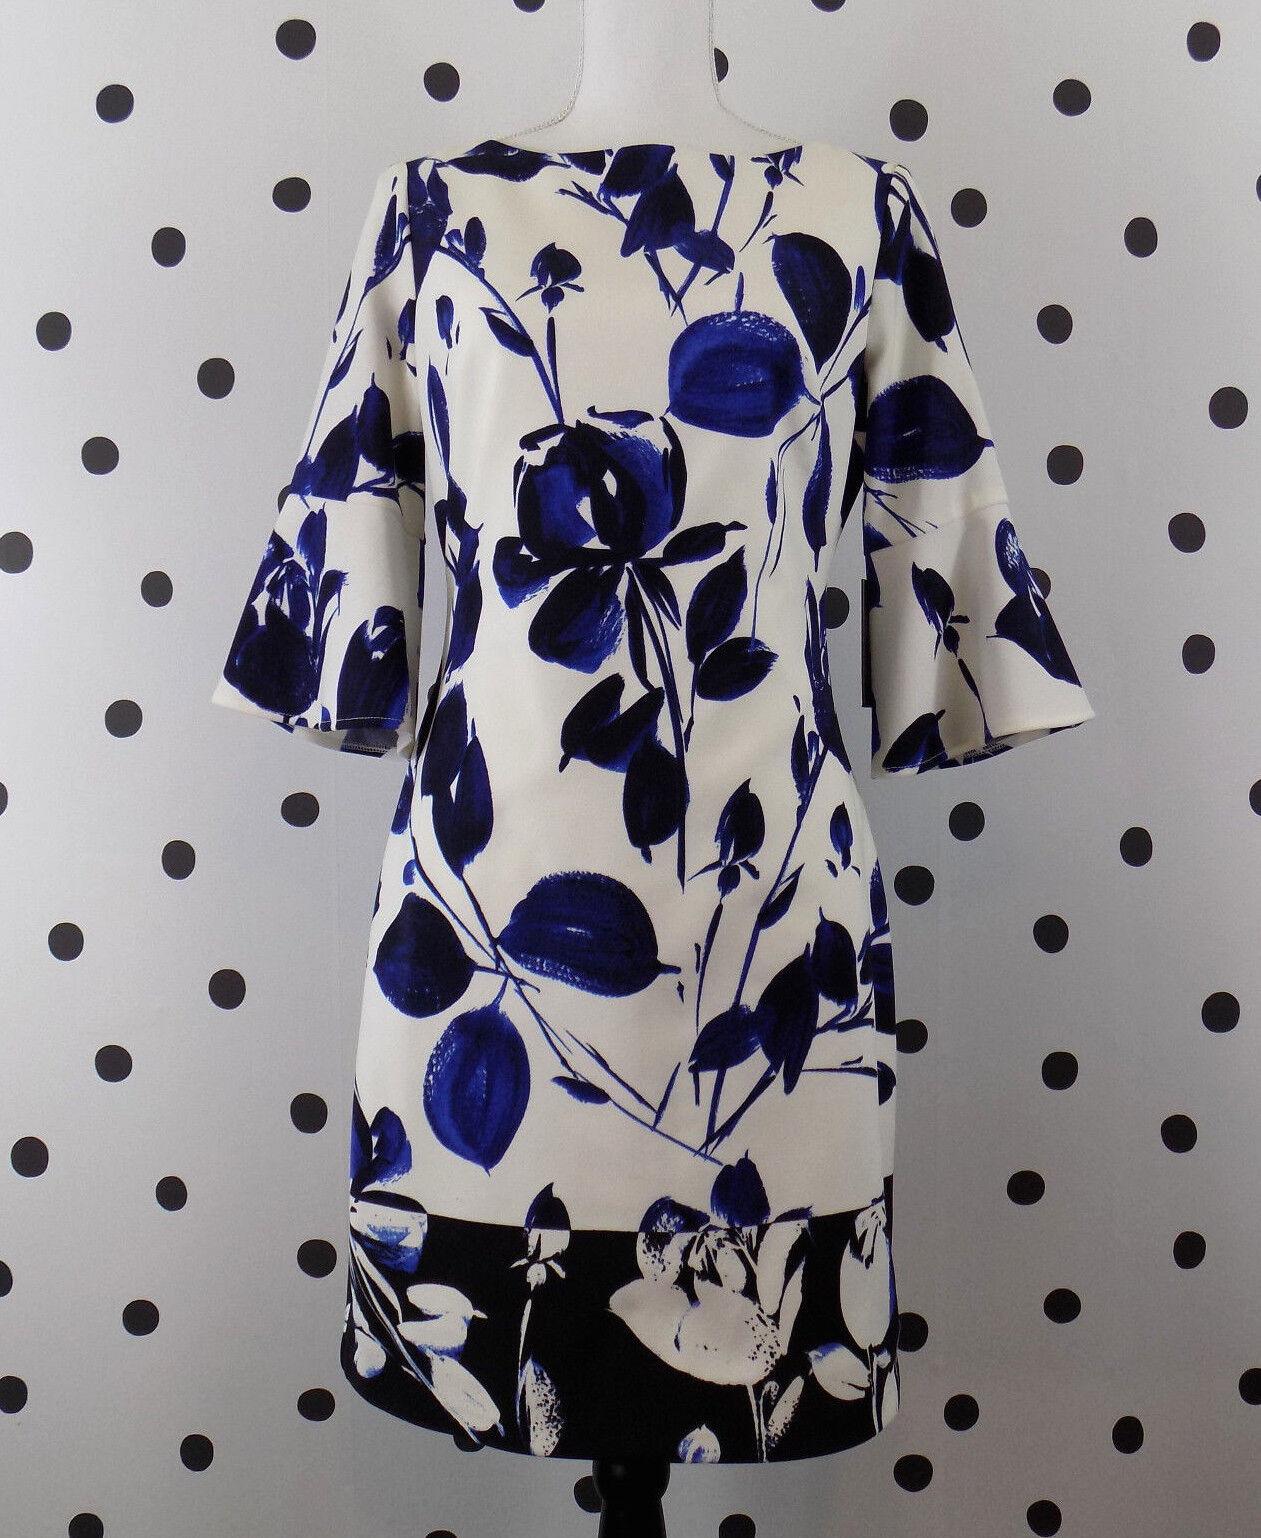 Vince Camuto damen Scuba Sheath Dress Größe 6 Floral Weiß Blau Bell Sleeve New